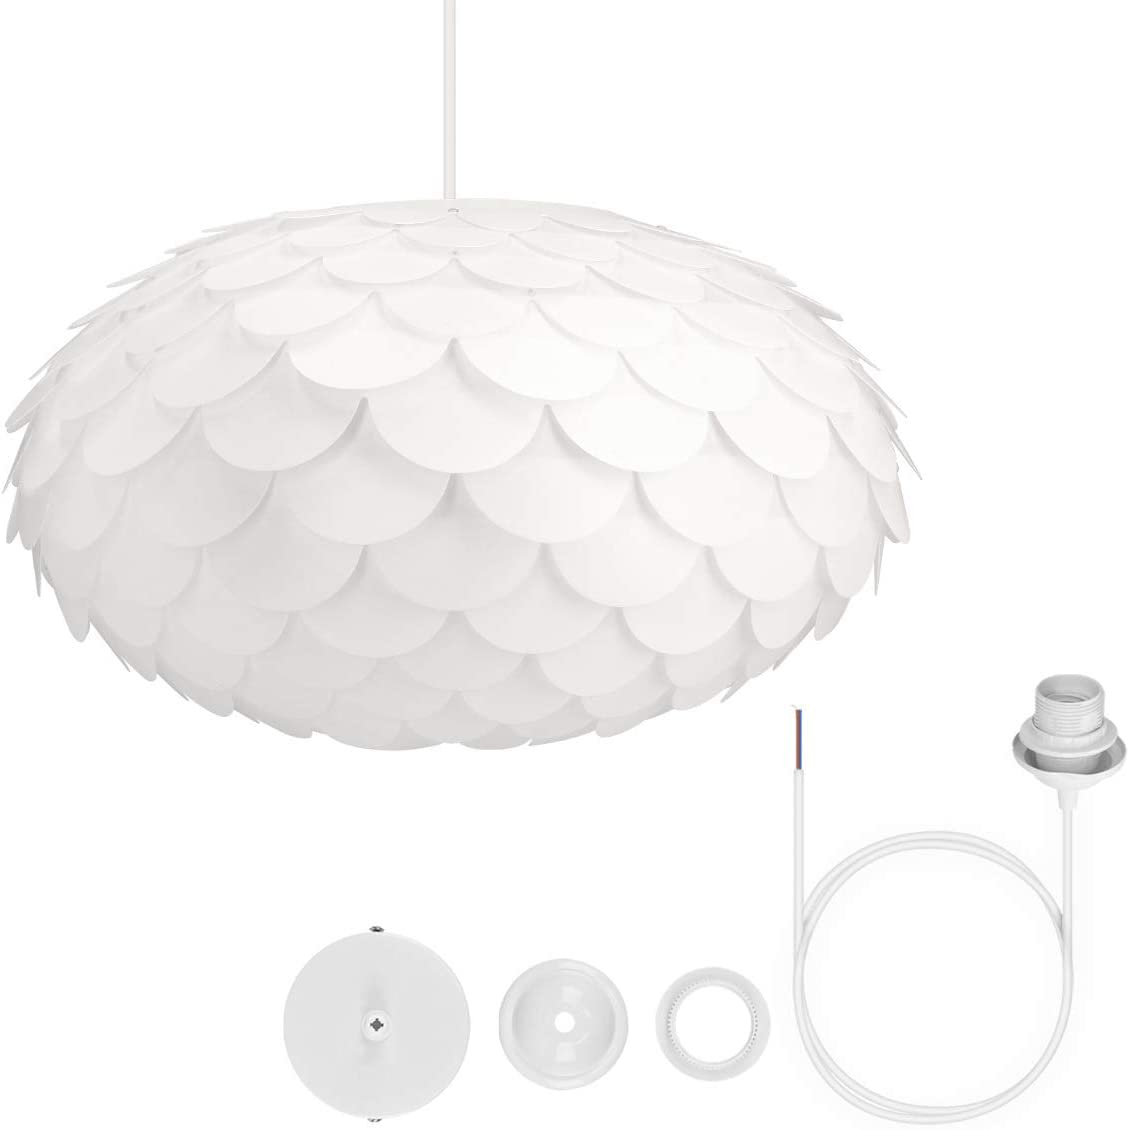 27 cm Gr DIY Puzzle Lampe Lampenschirm Schirm min M in Weiß 15 Designs Ø ca